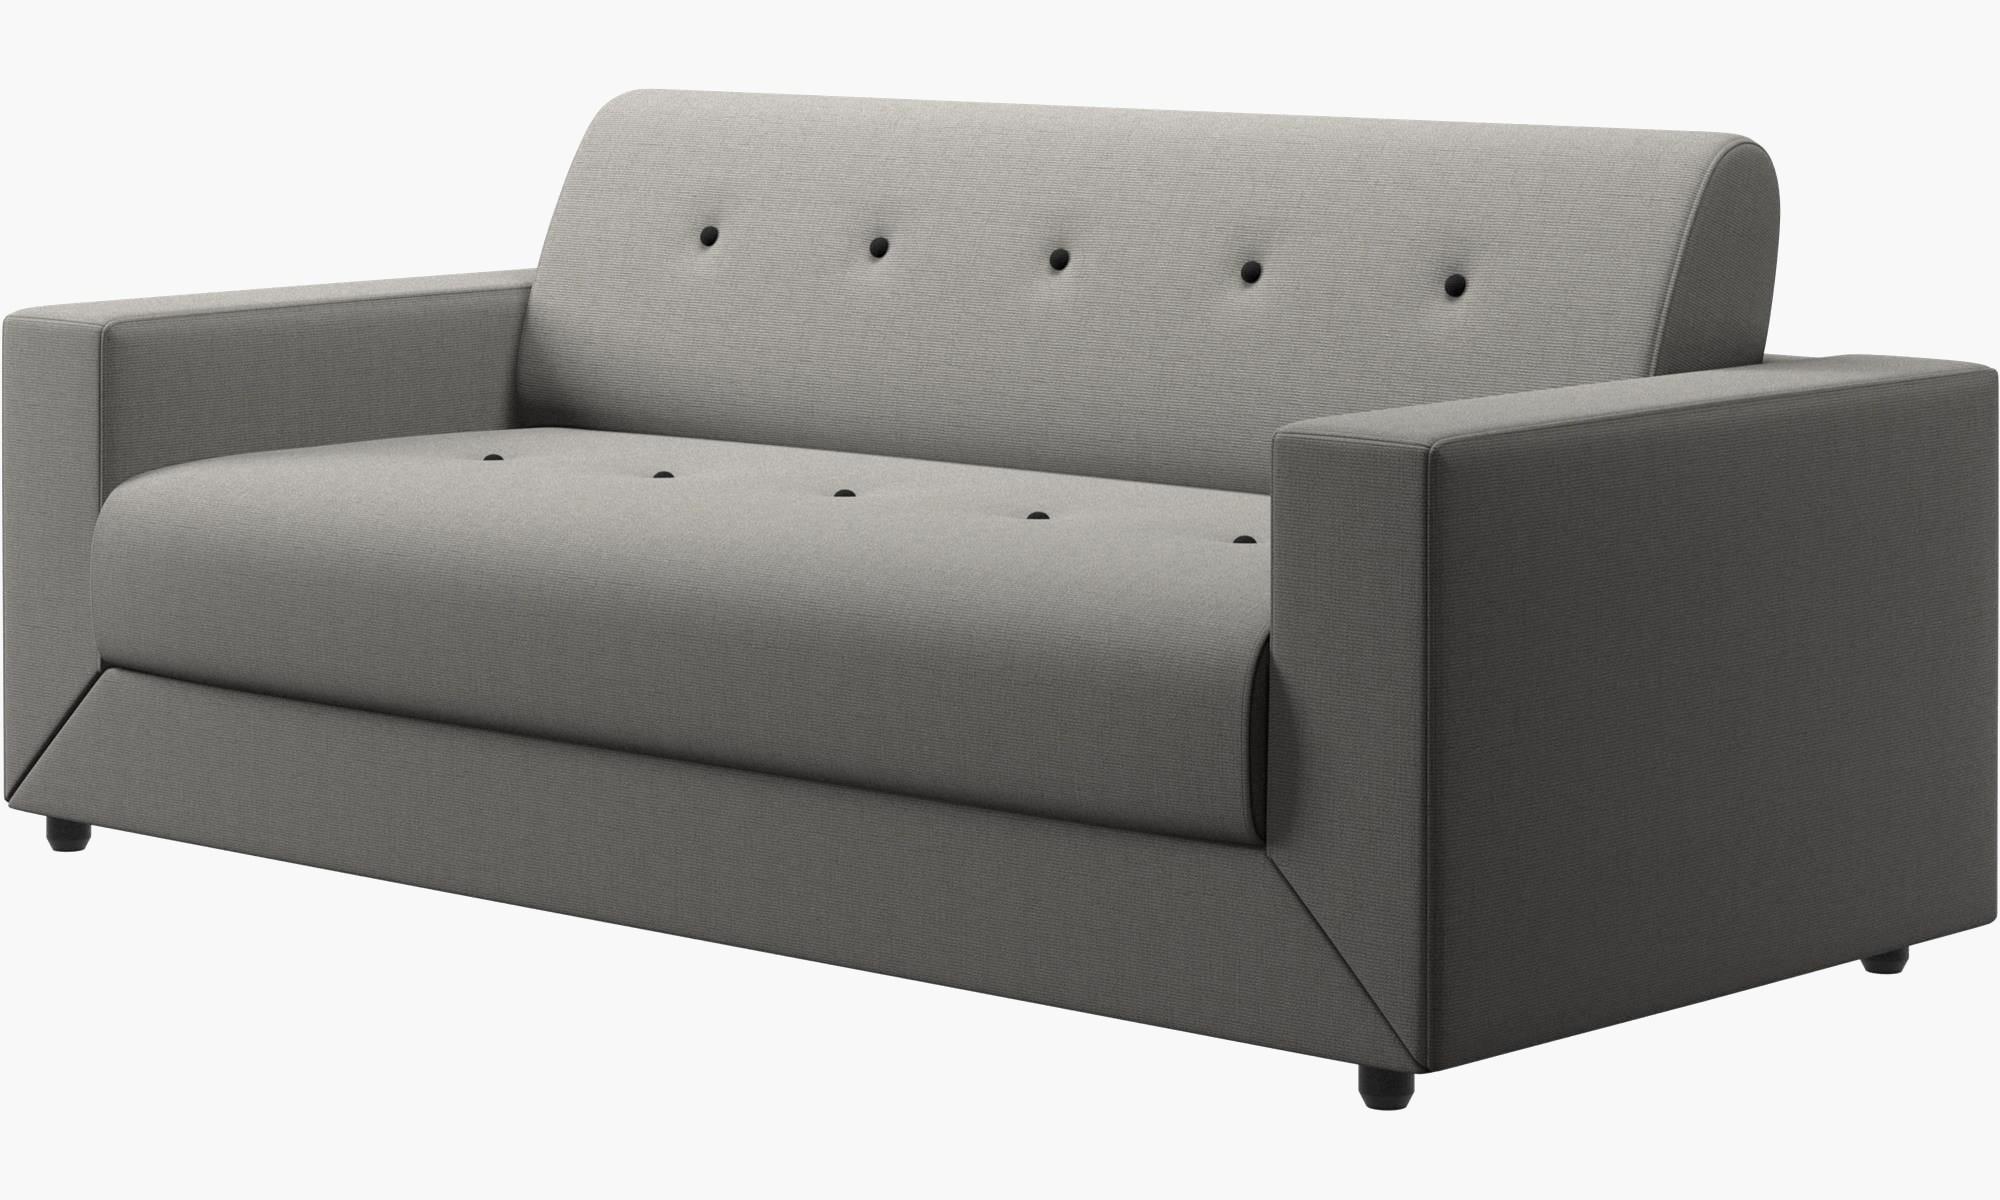 Sillon Cama 1 Plaza Merkamueble Budm Merkamueble sofas Cama 60 Creaciones Sillon Cama 1 Plaza Merkamueble